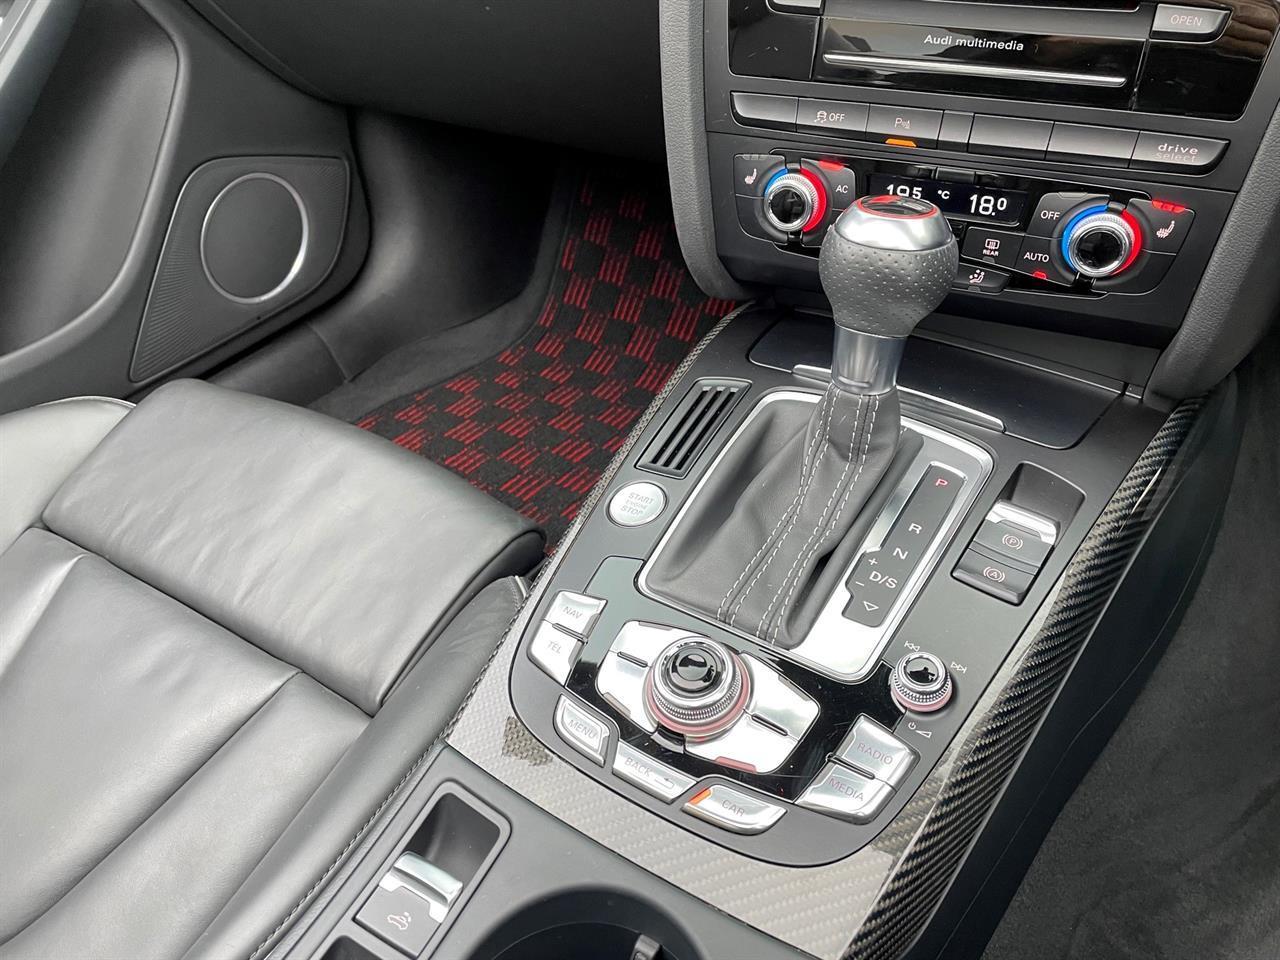 image-10, 2013 Audi RS5 4.2 V8 FSI Facelift Convertible at Christchurch